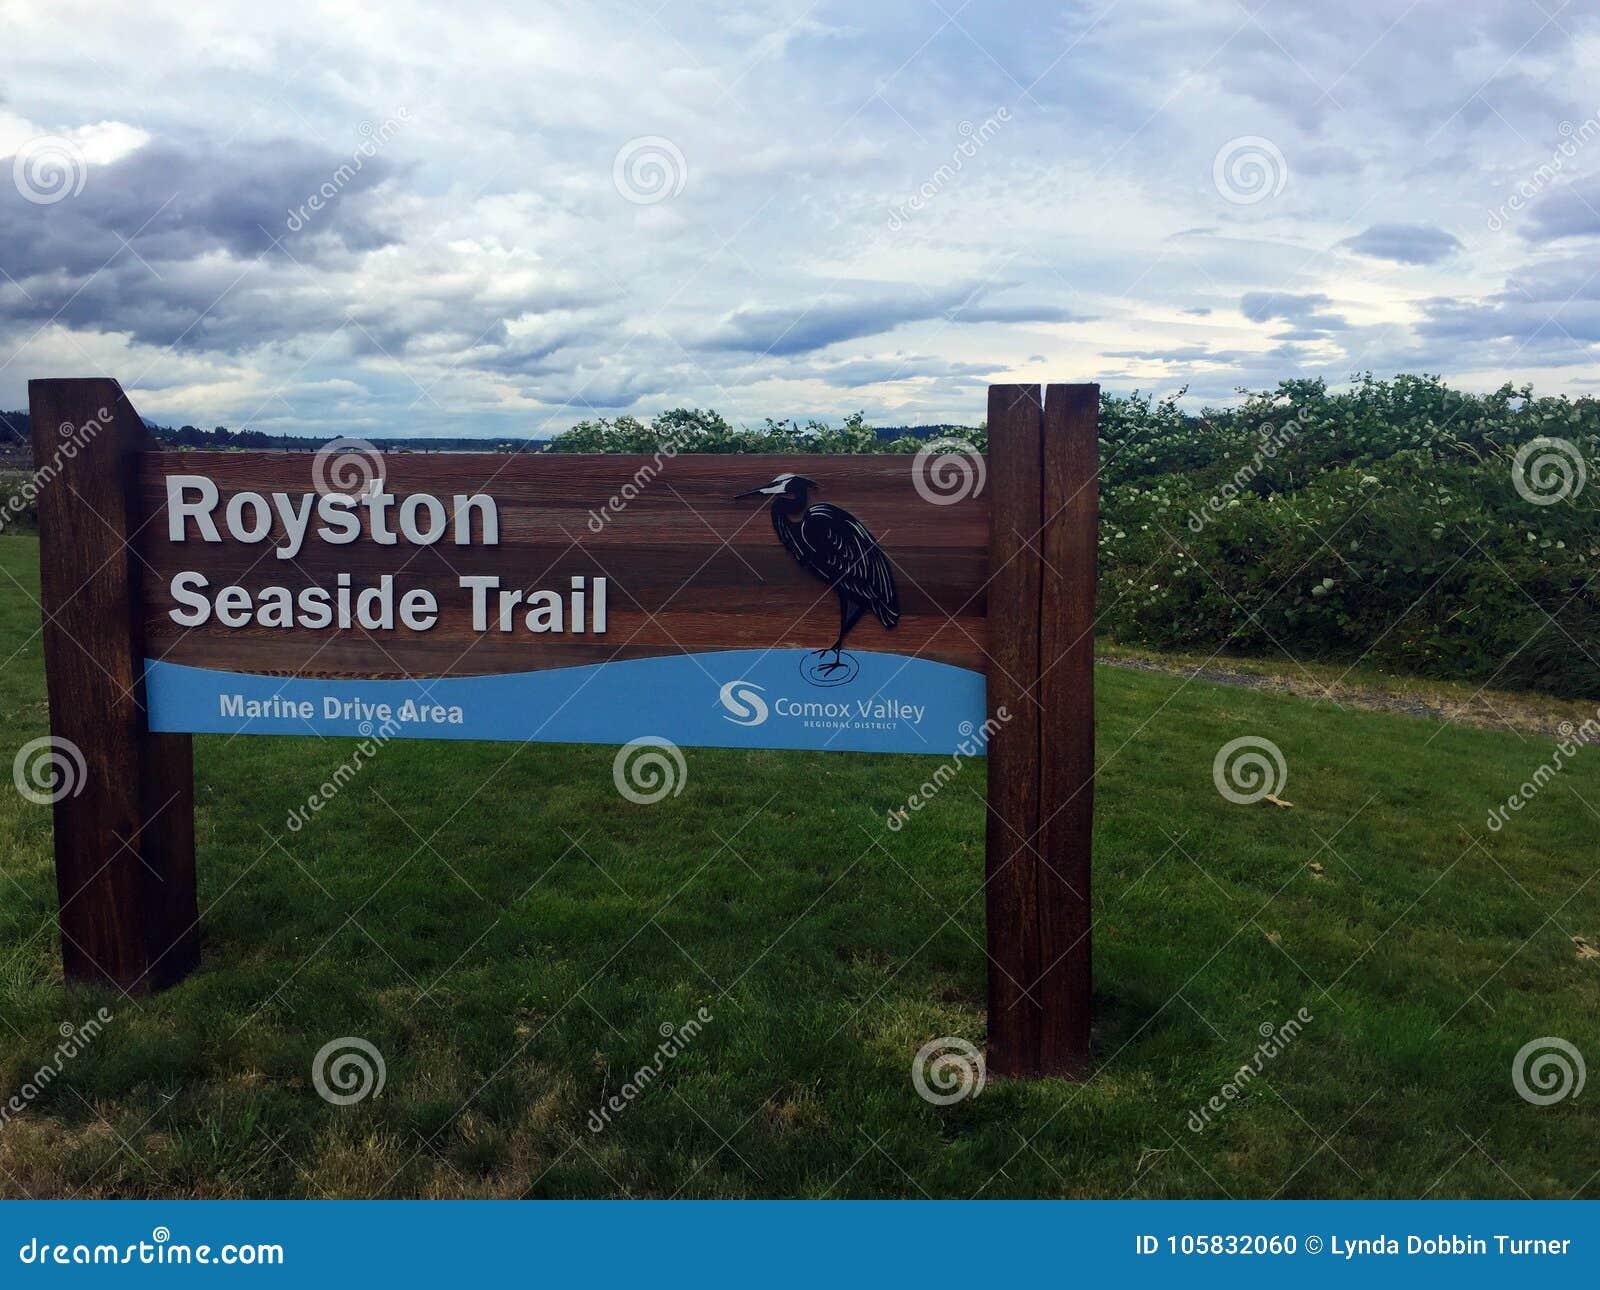 Royston Seaside Trail, Royston, BC